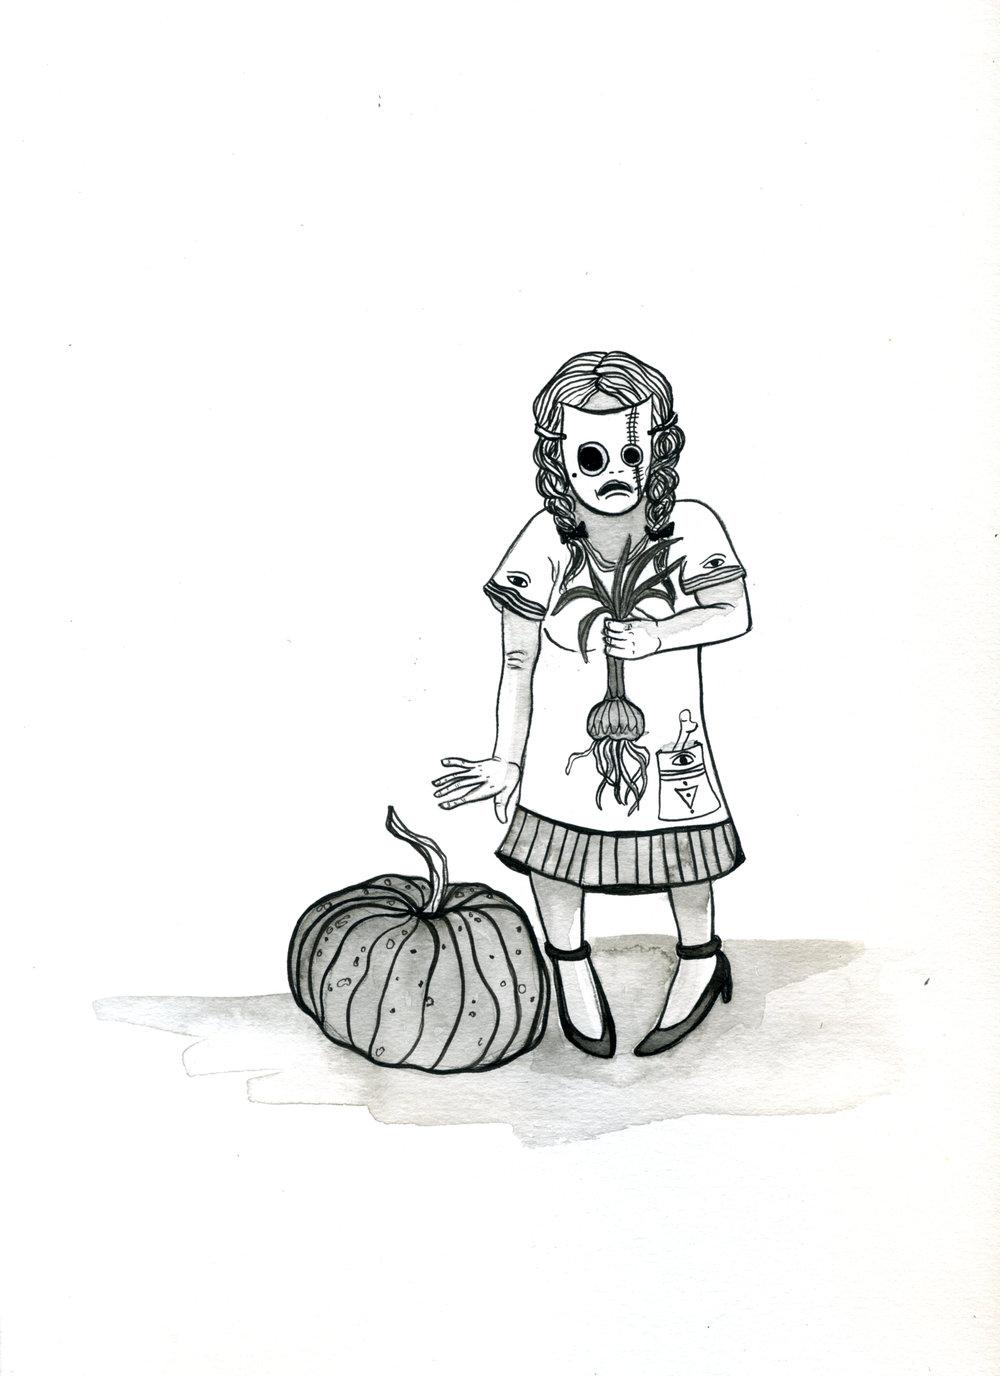 Creepy li'l onion girl.